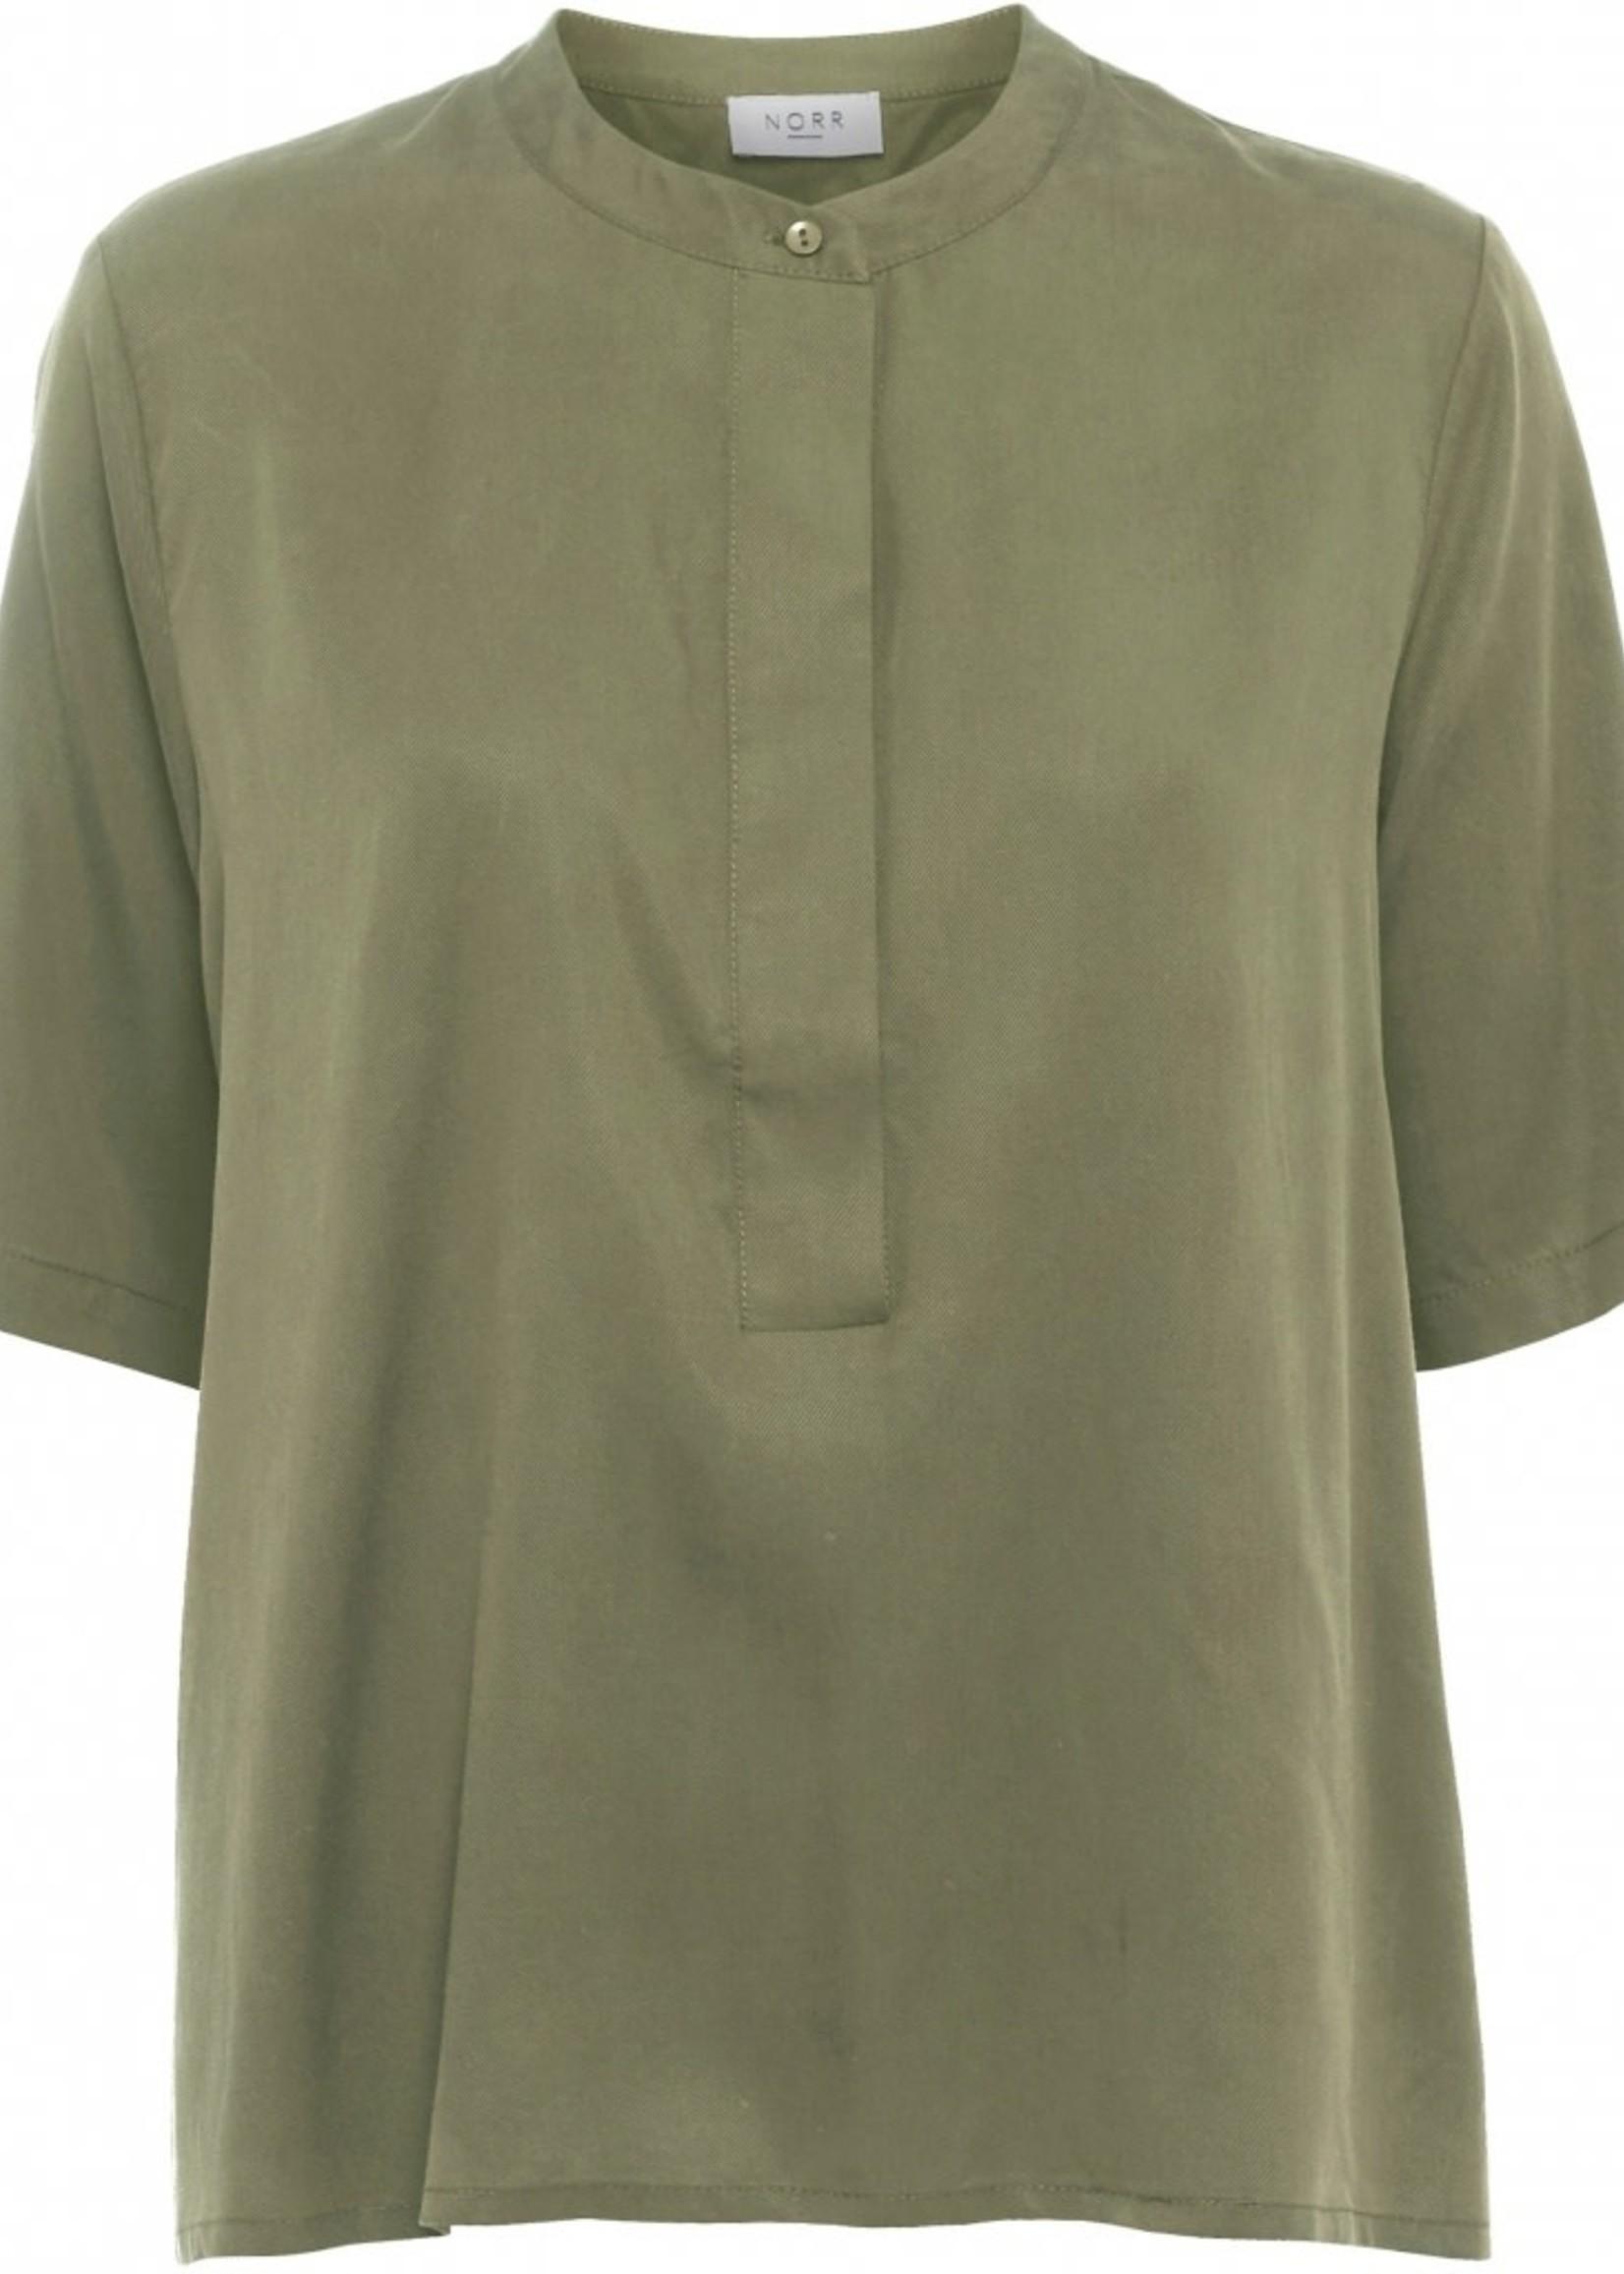 Norr Norr Tenna shirt